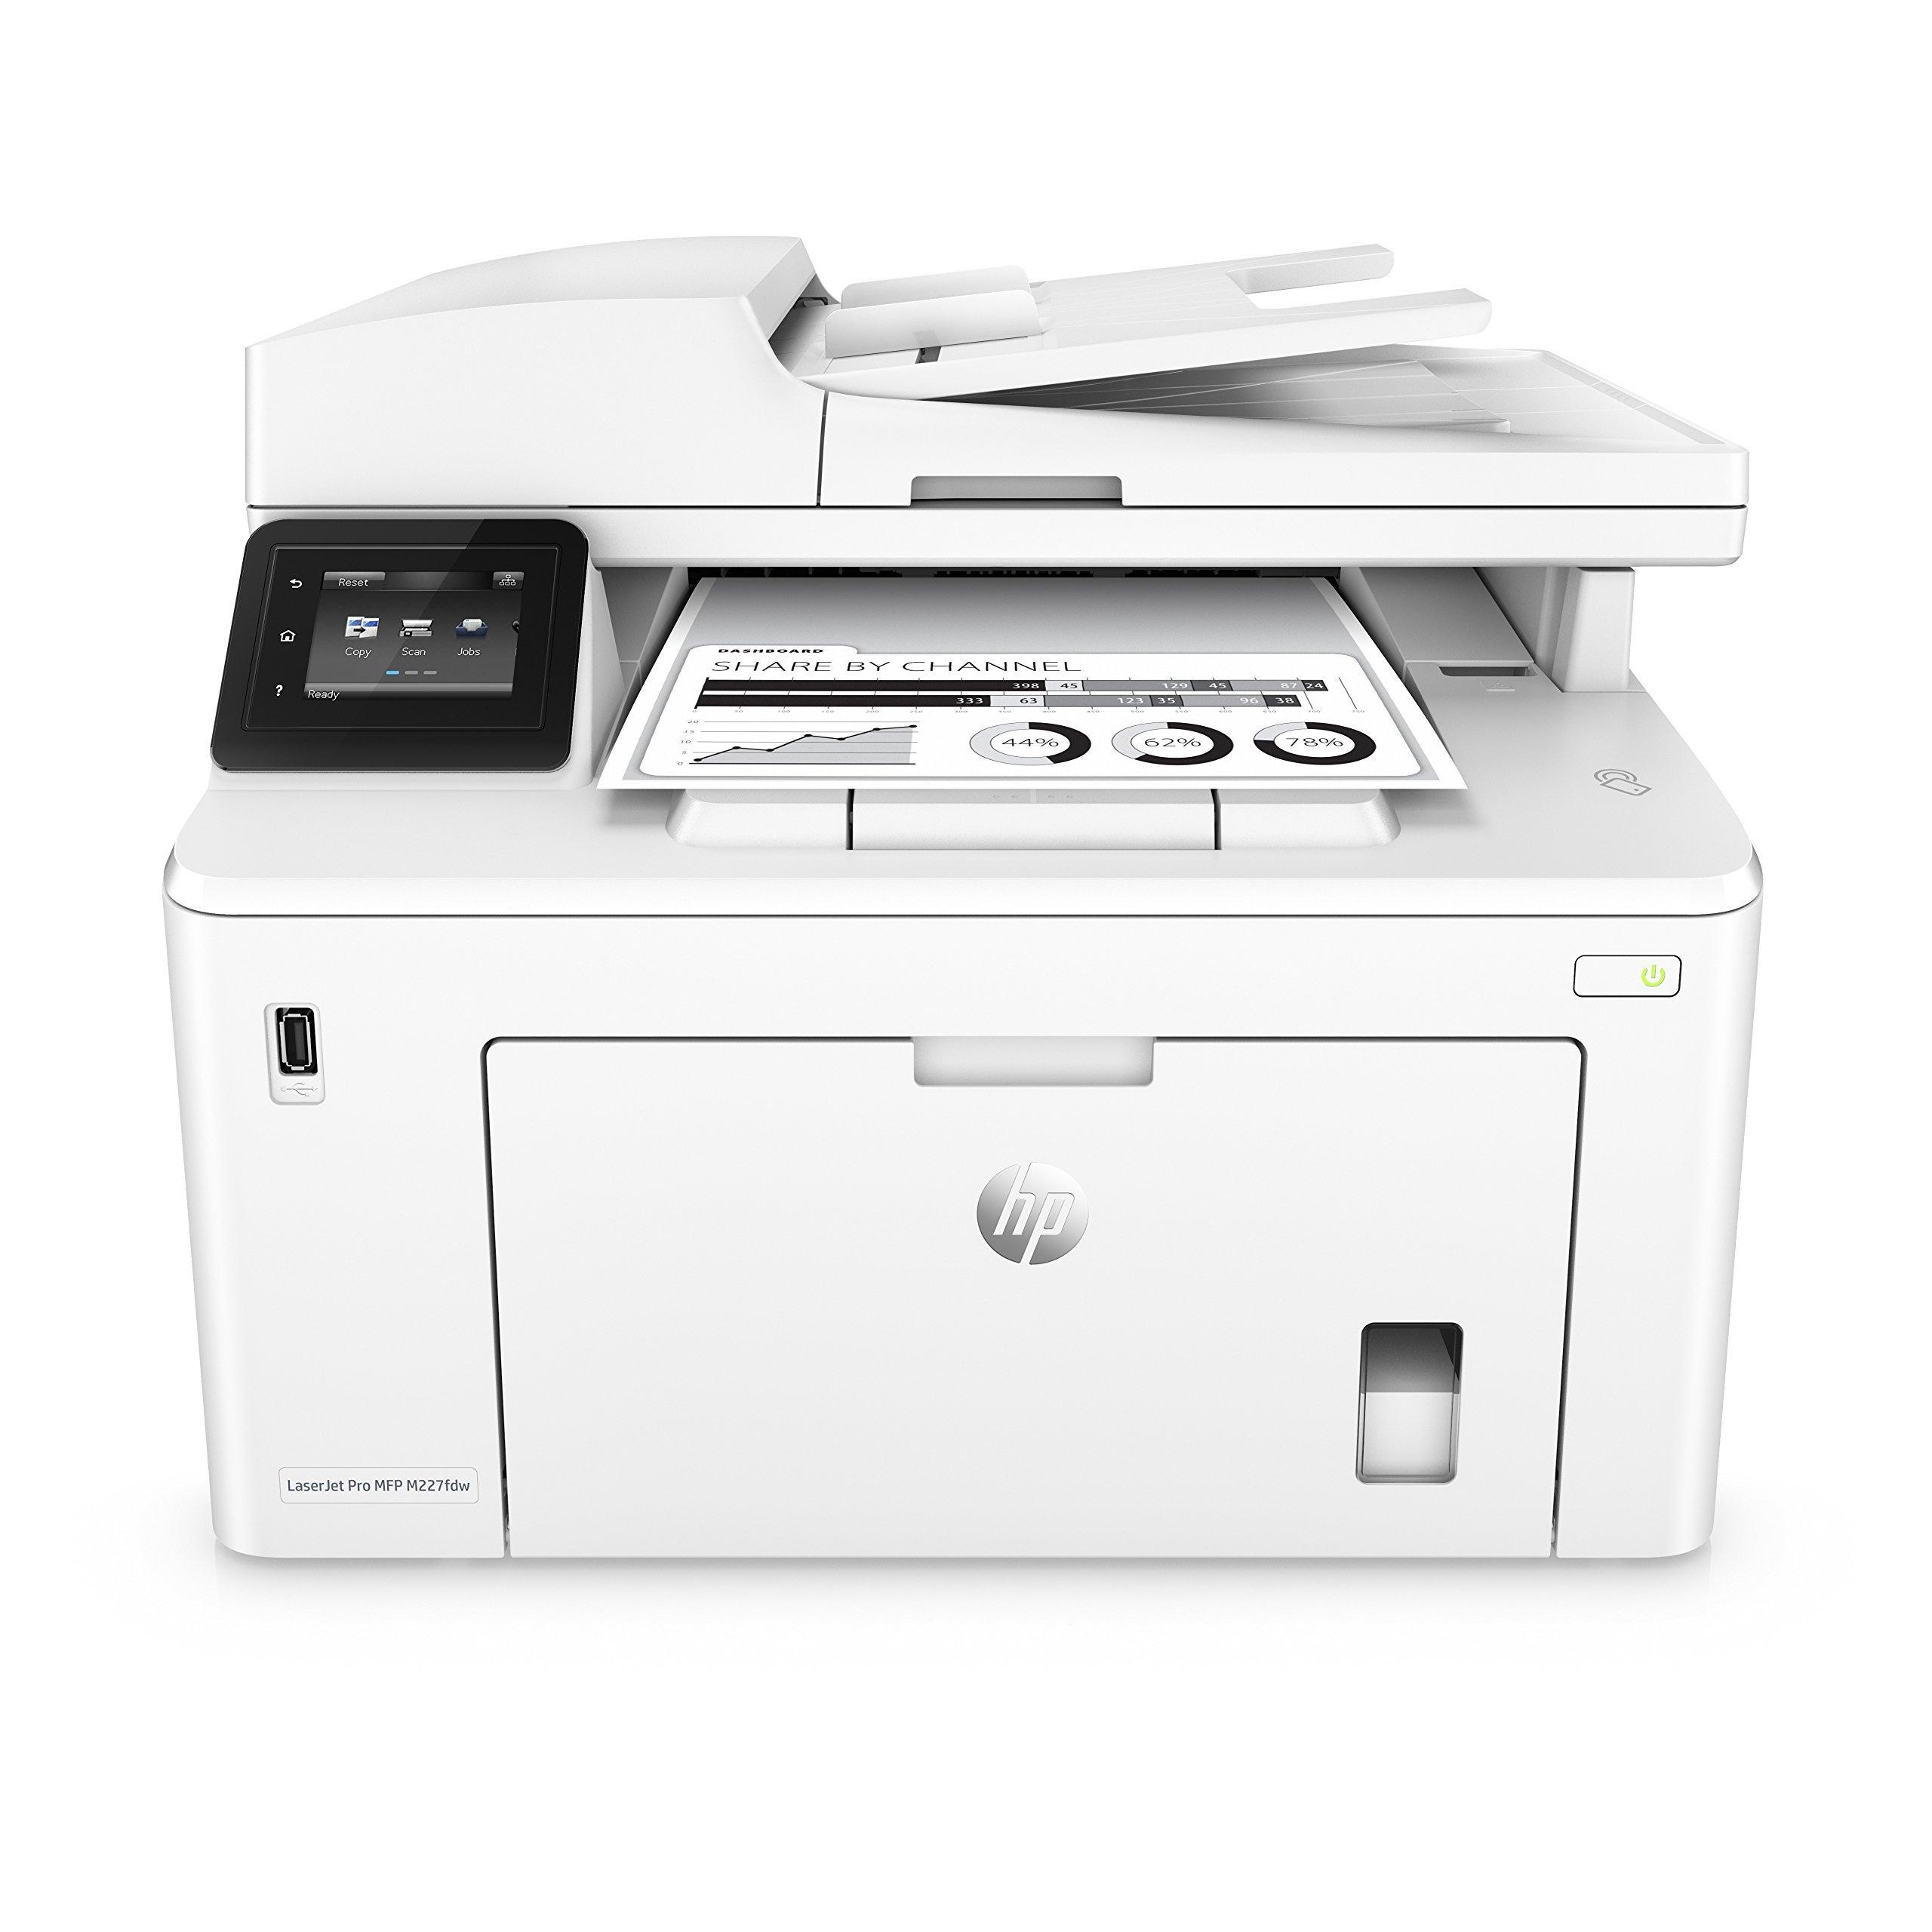 HP Laserjet Pro M227fdw All-in-One Wireless Laser Printer, Amazon Dash Replenishment Ready (G3Q75A). - (Renewed)